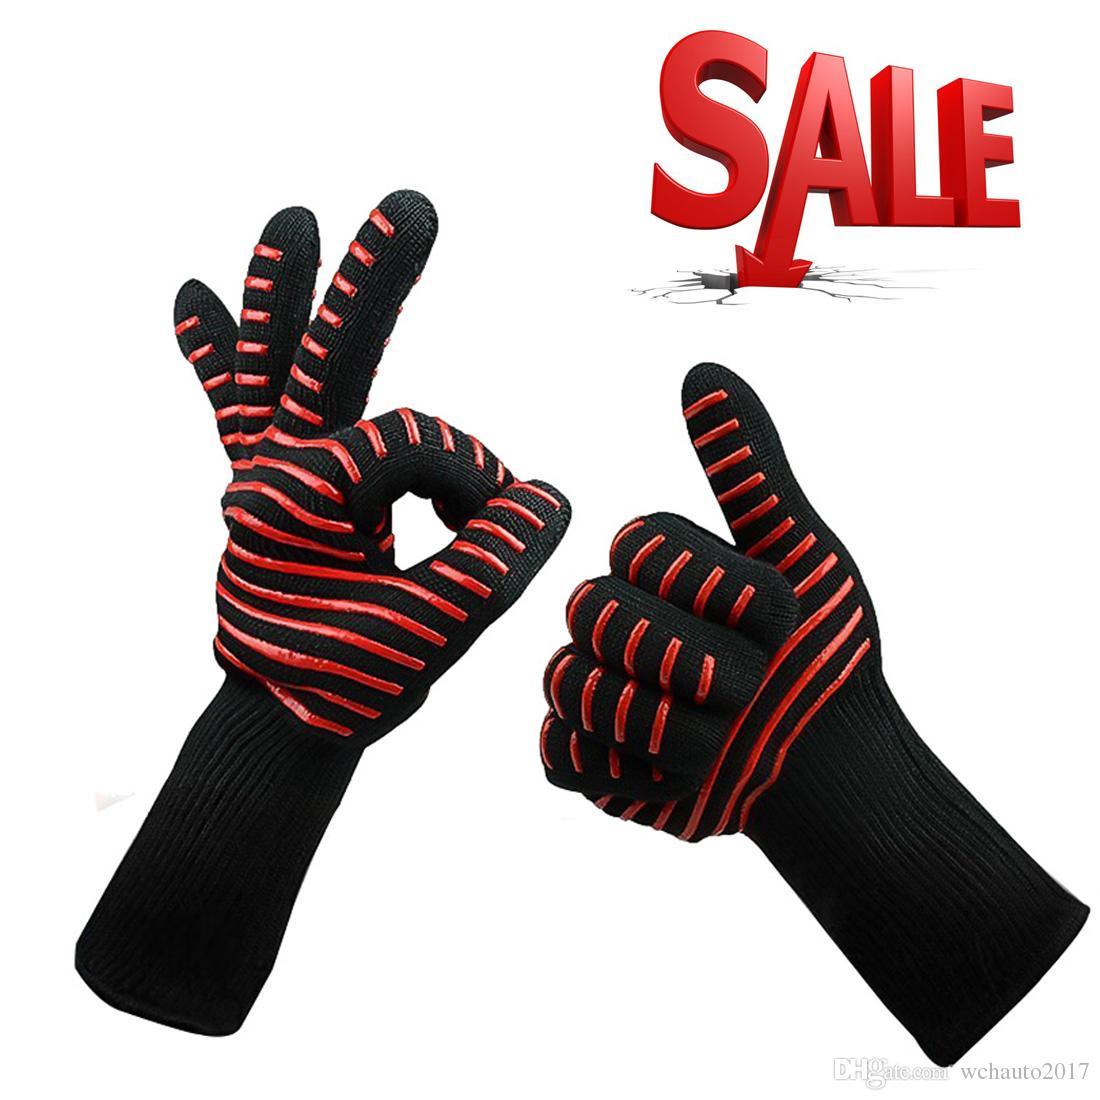 Küche Silikon Handschuhe BBQ Grillen Kochhandschuhe Hitzebeständige Handschuhe